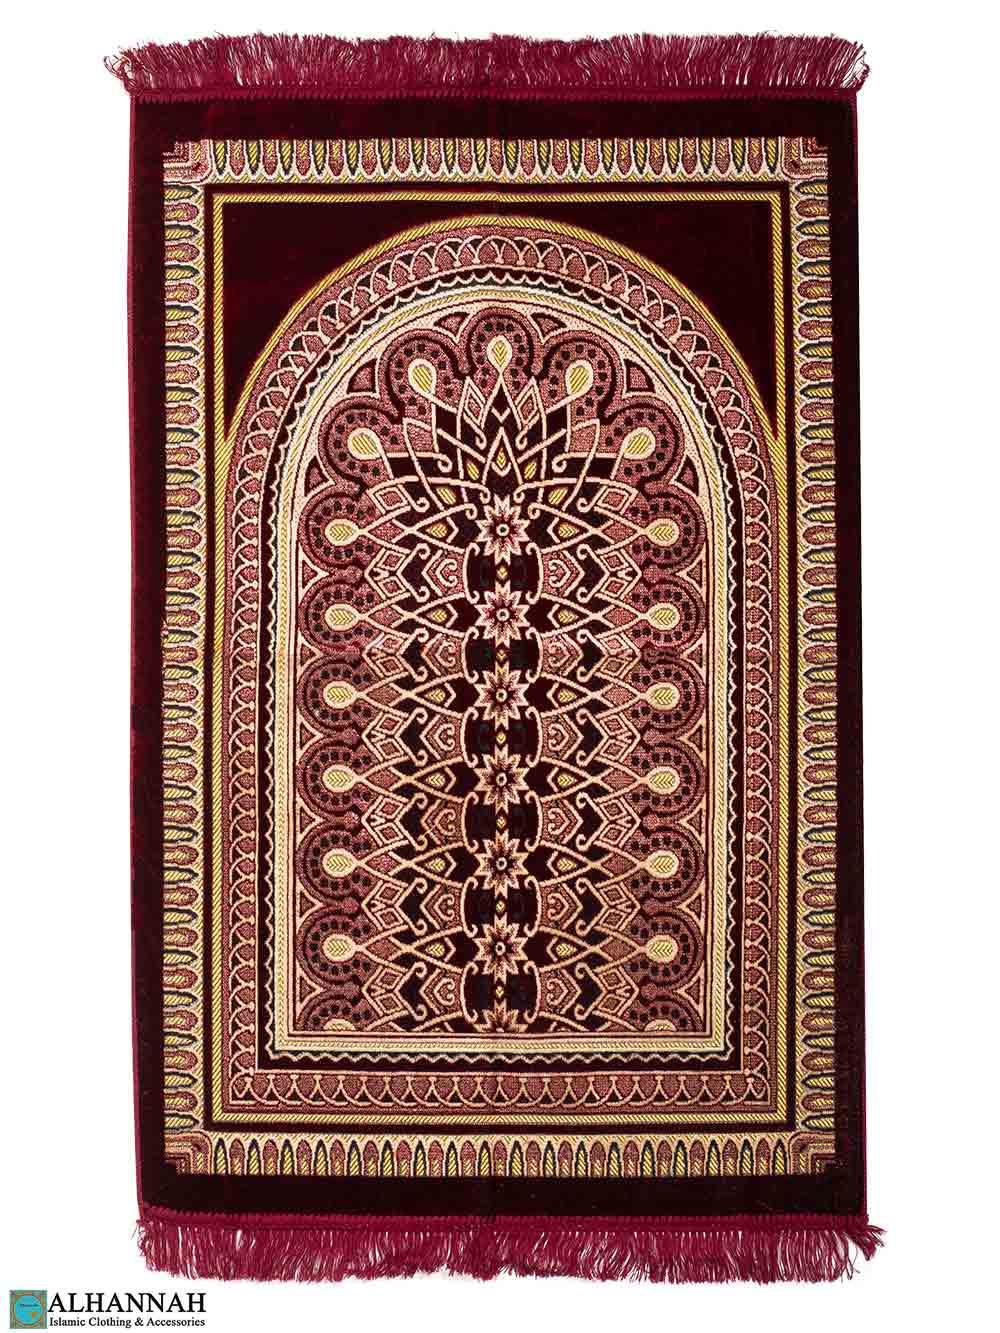 Prayer Rug Symmetry Design - Red